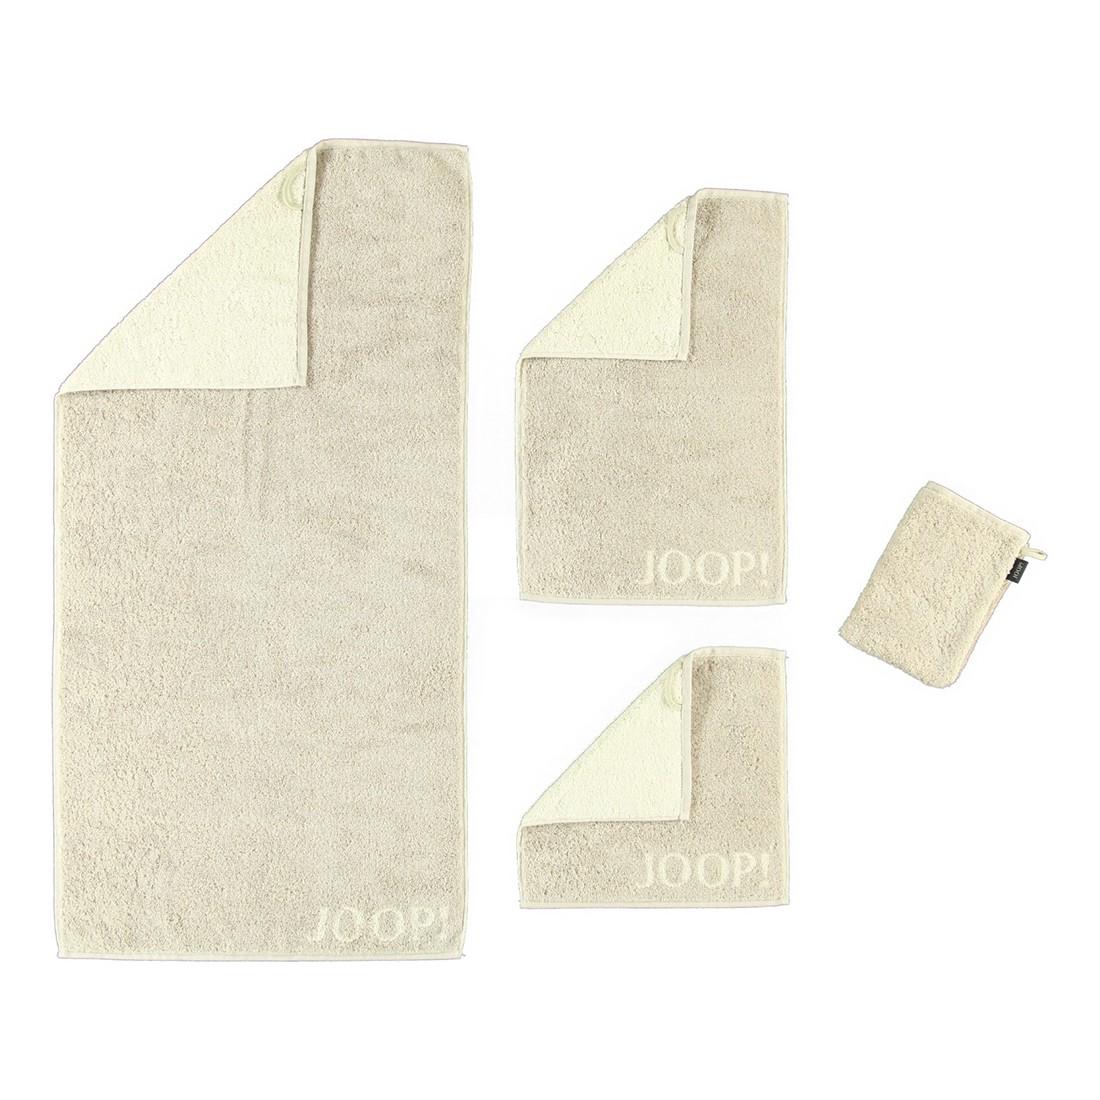 Handtuch Classic Doubleface – 100% Baumwolle Sand – 30 – Seiflappen: 30 x 30 cm, Joop kaufen